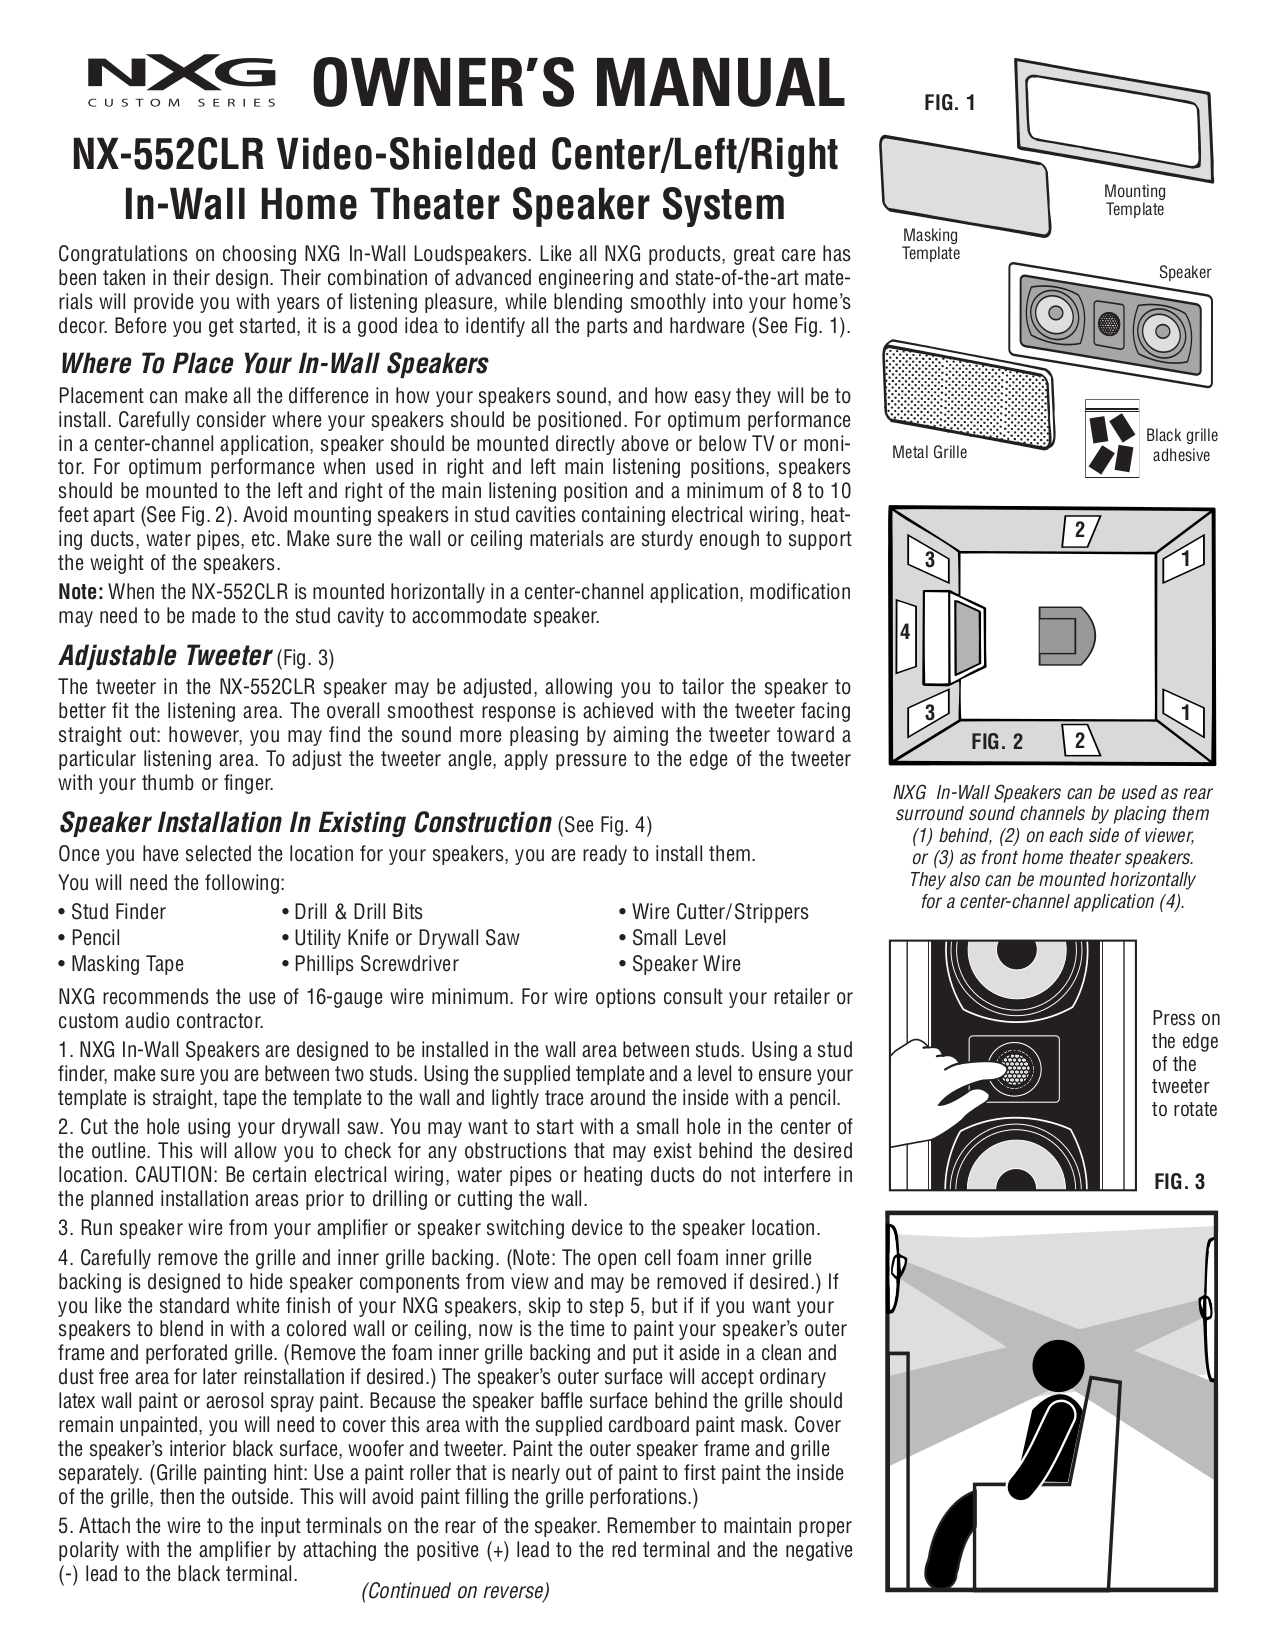 pdf for Nxg Speaker 552CLR manual